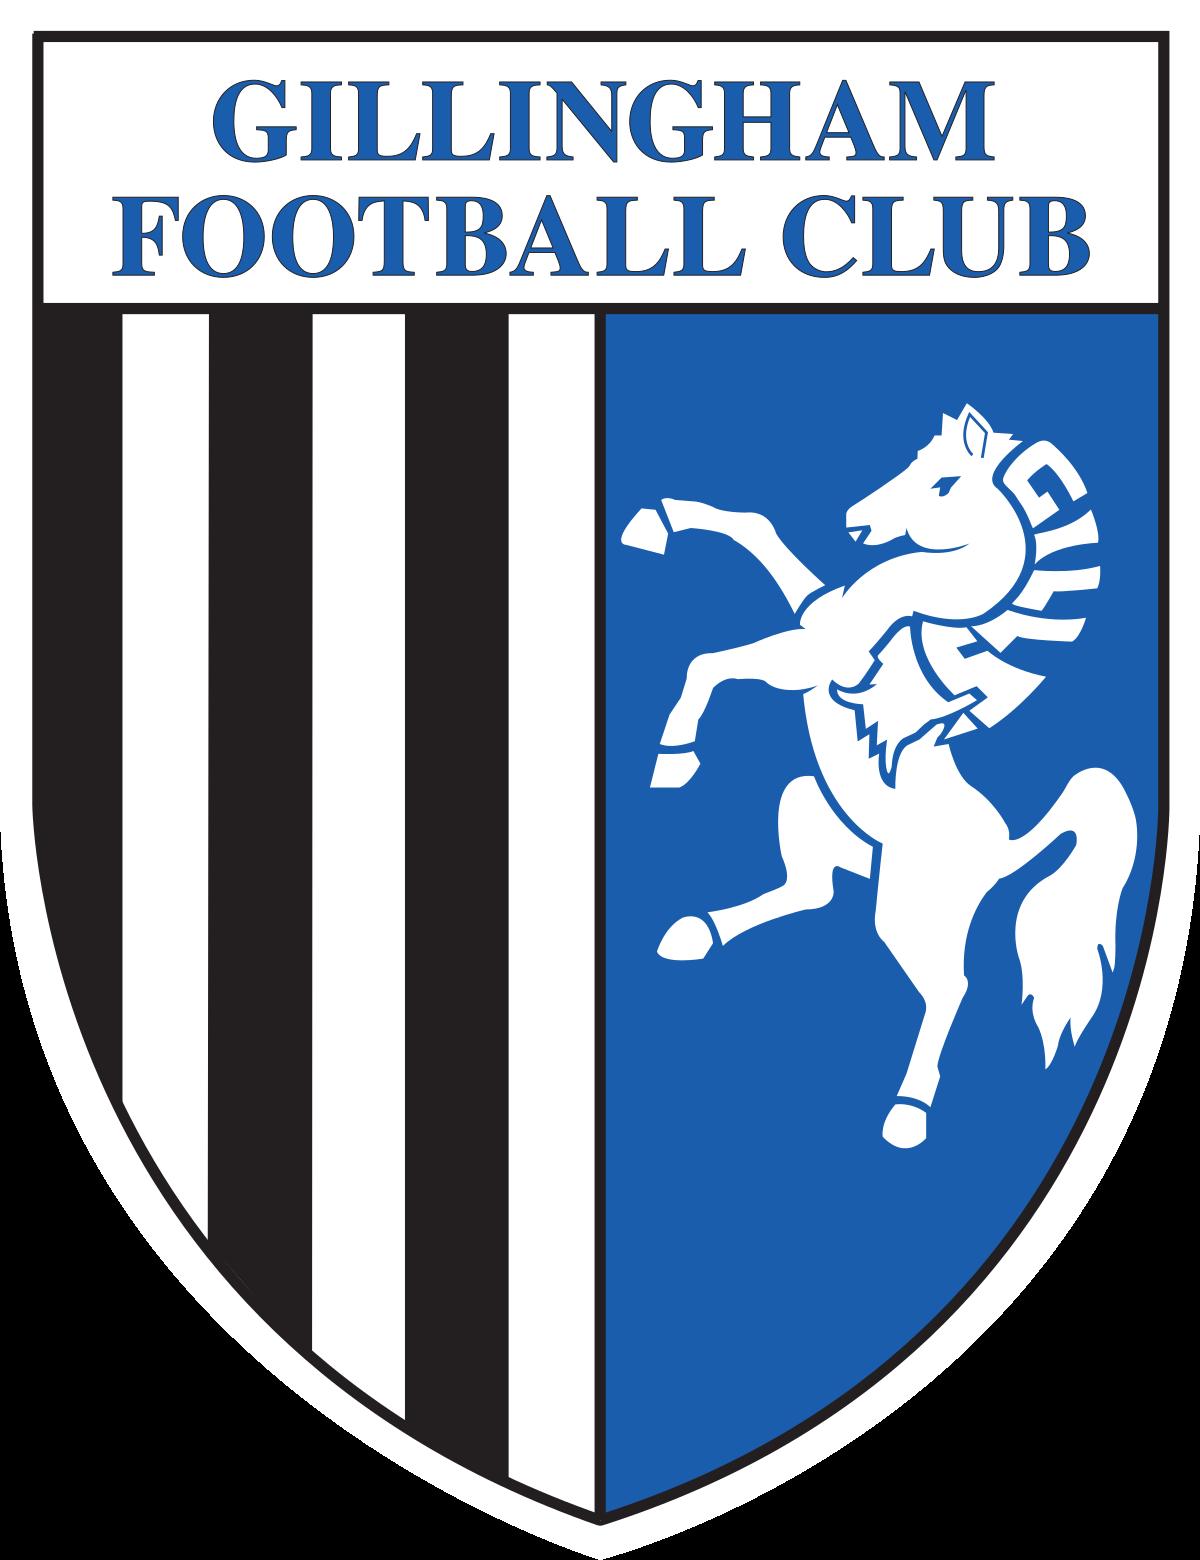 Gillingham crest